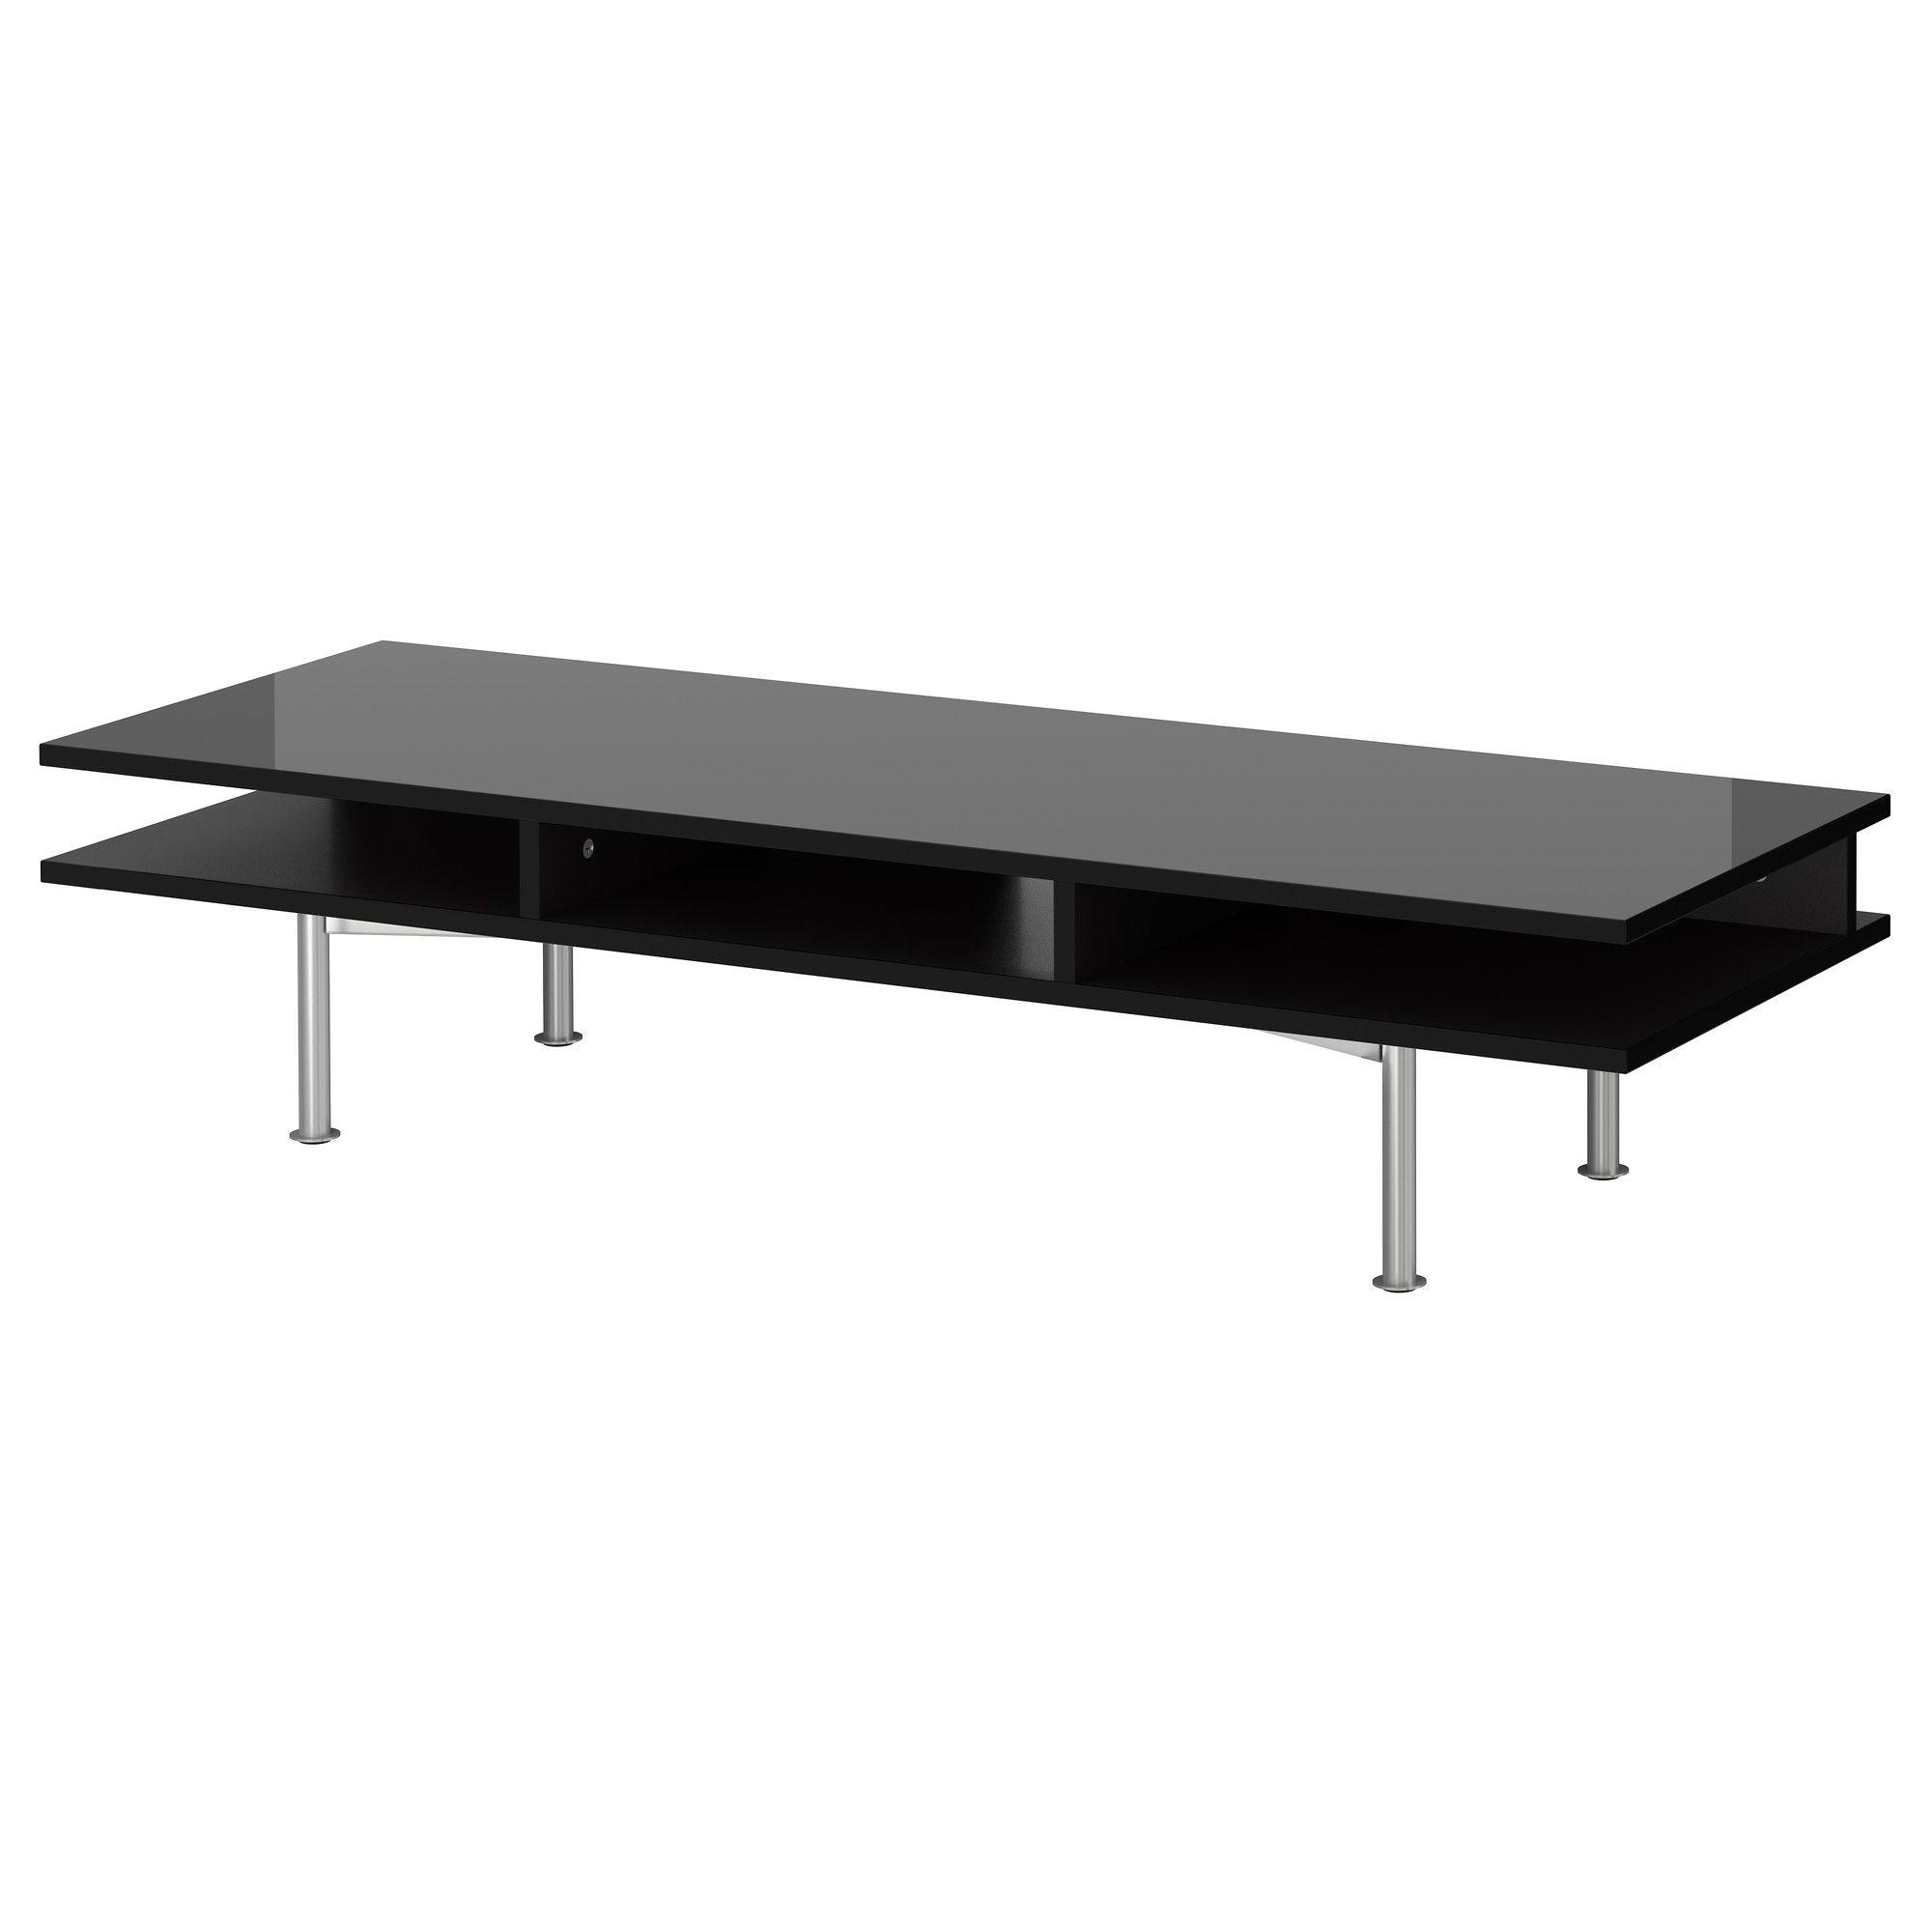 Tofteryd Tv Unit High Gloss Black Ikea 119 00 As Of 07 26 2017